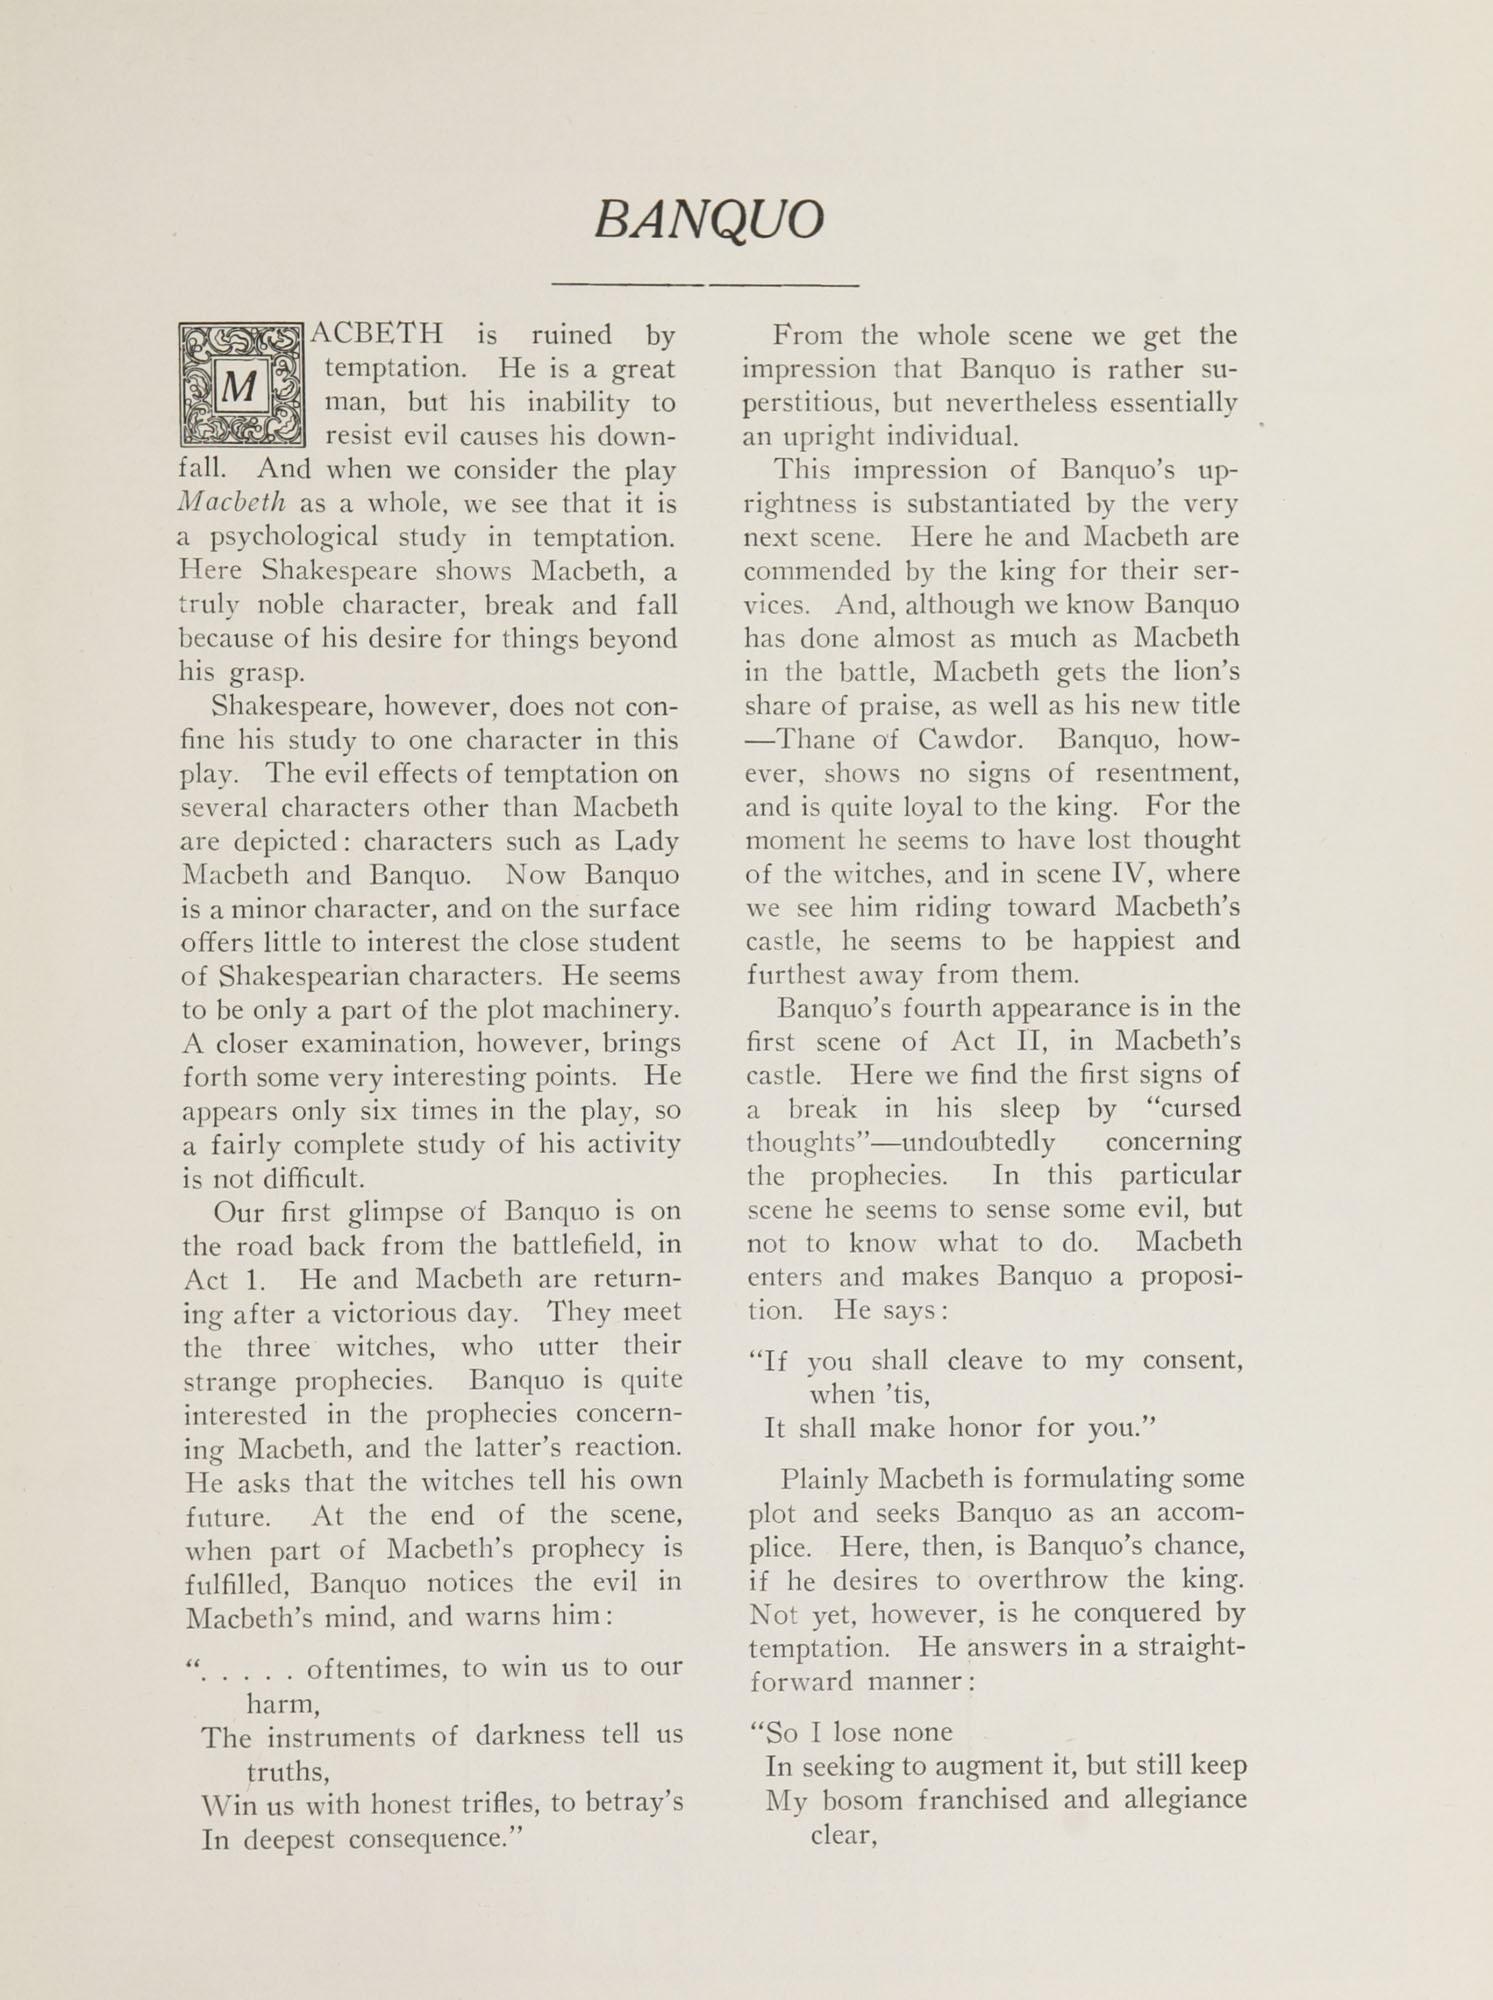 College of Charleston Magazine, 1937-1938, Vol. XXXXI No. 1, page 25